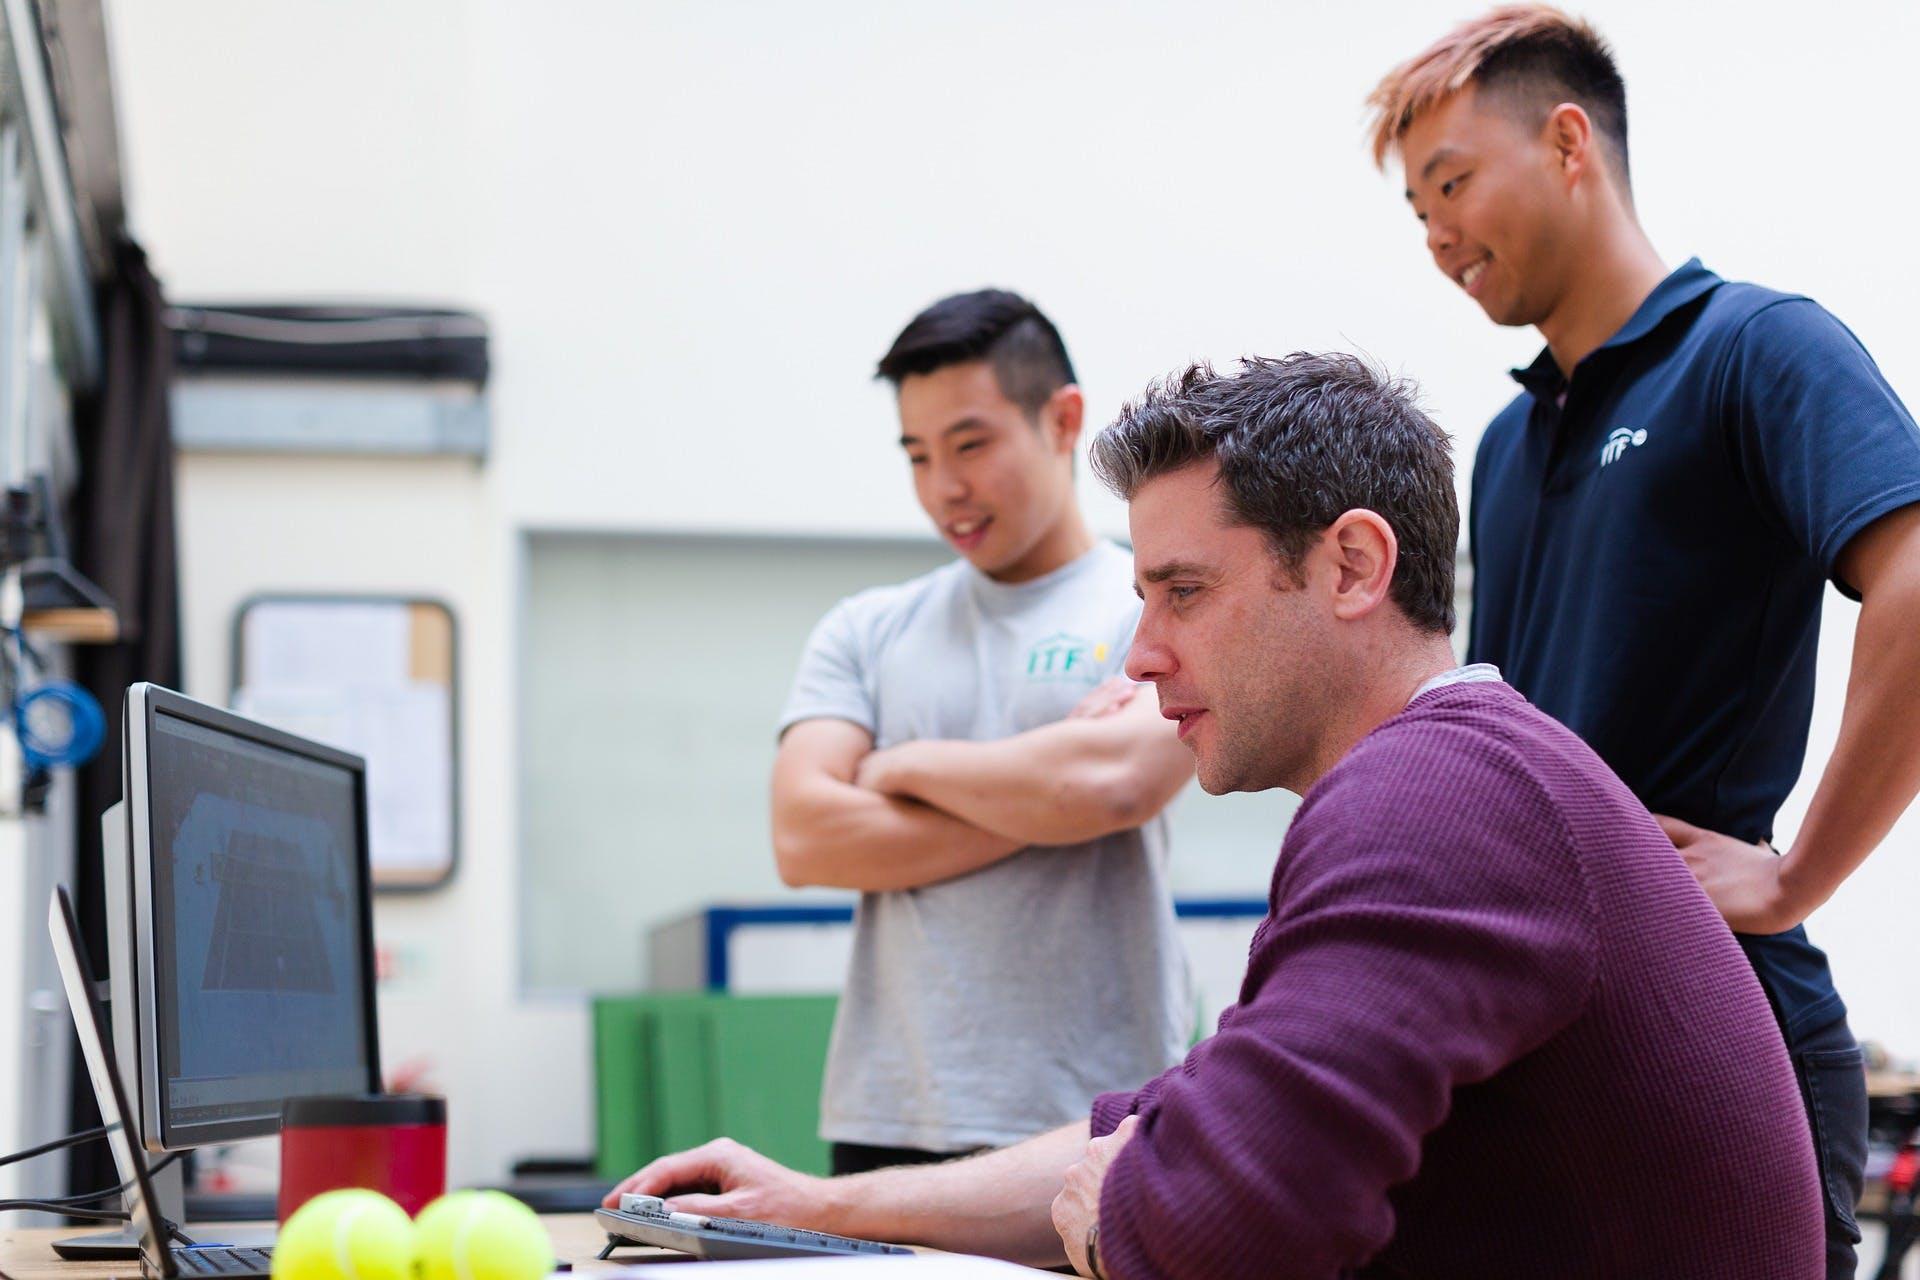 Computer Science & Information Technology Remote Internships